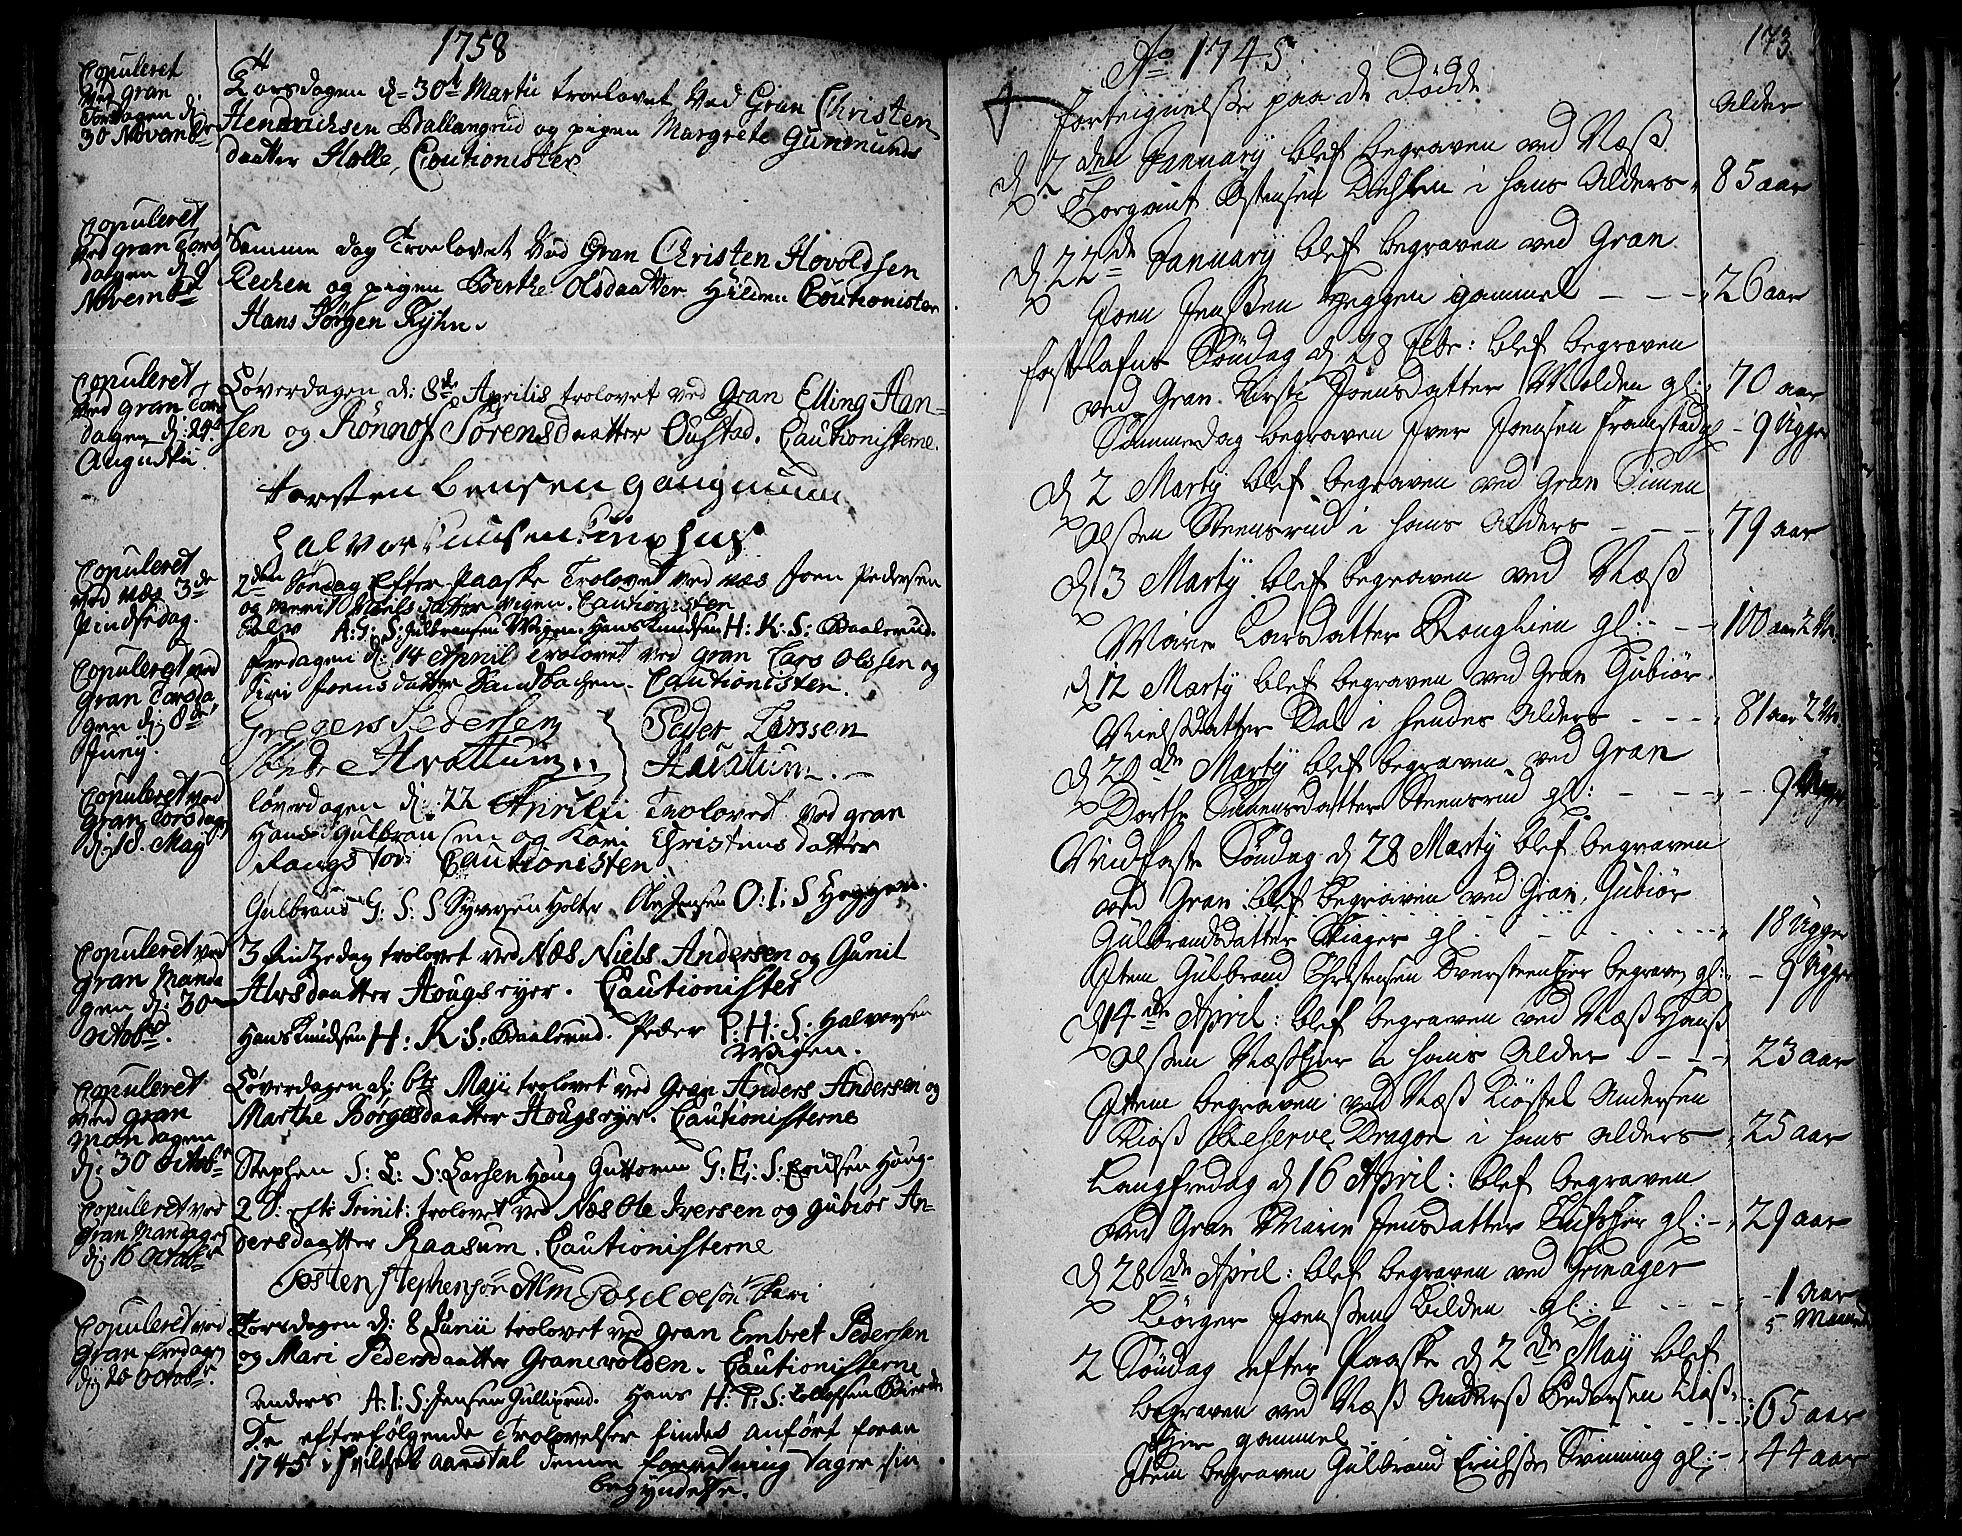 SAH, Gran prestekontor, Ministerialbok nr. 3, 1745-1758, s. 173